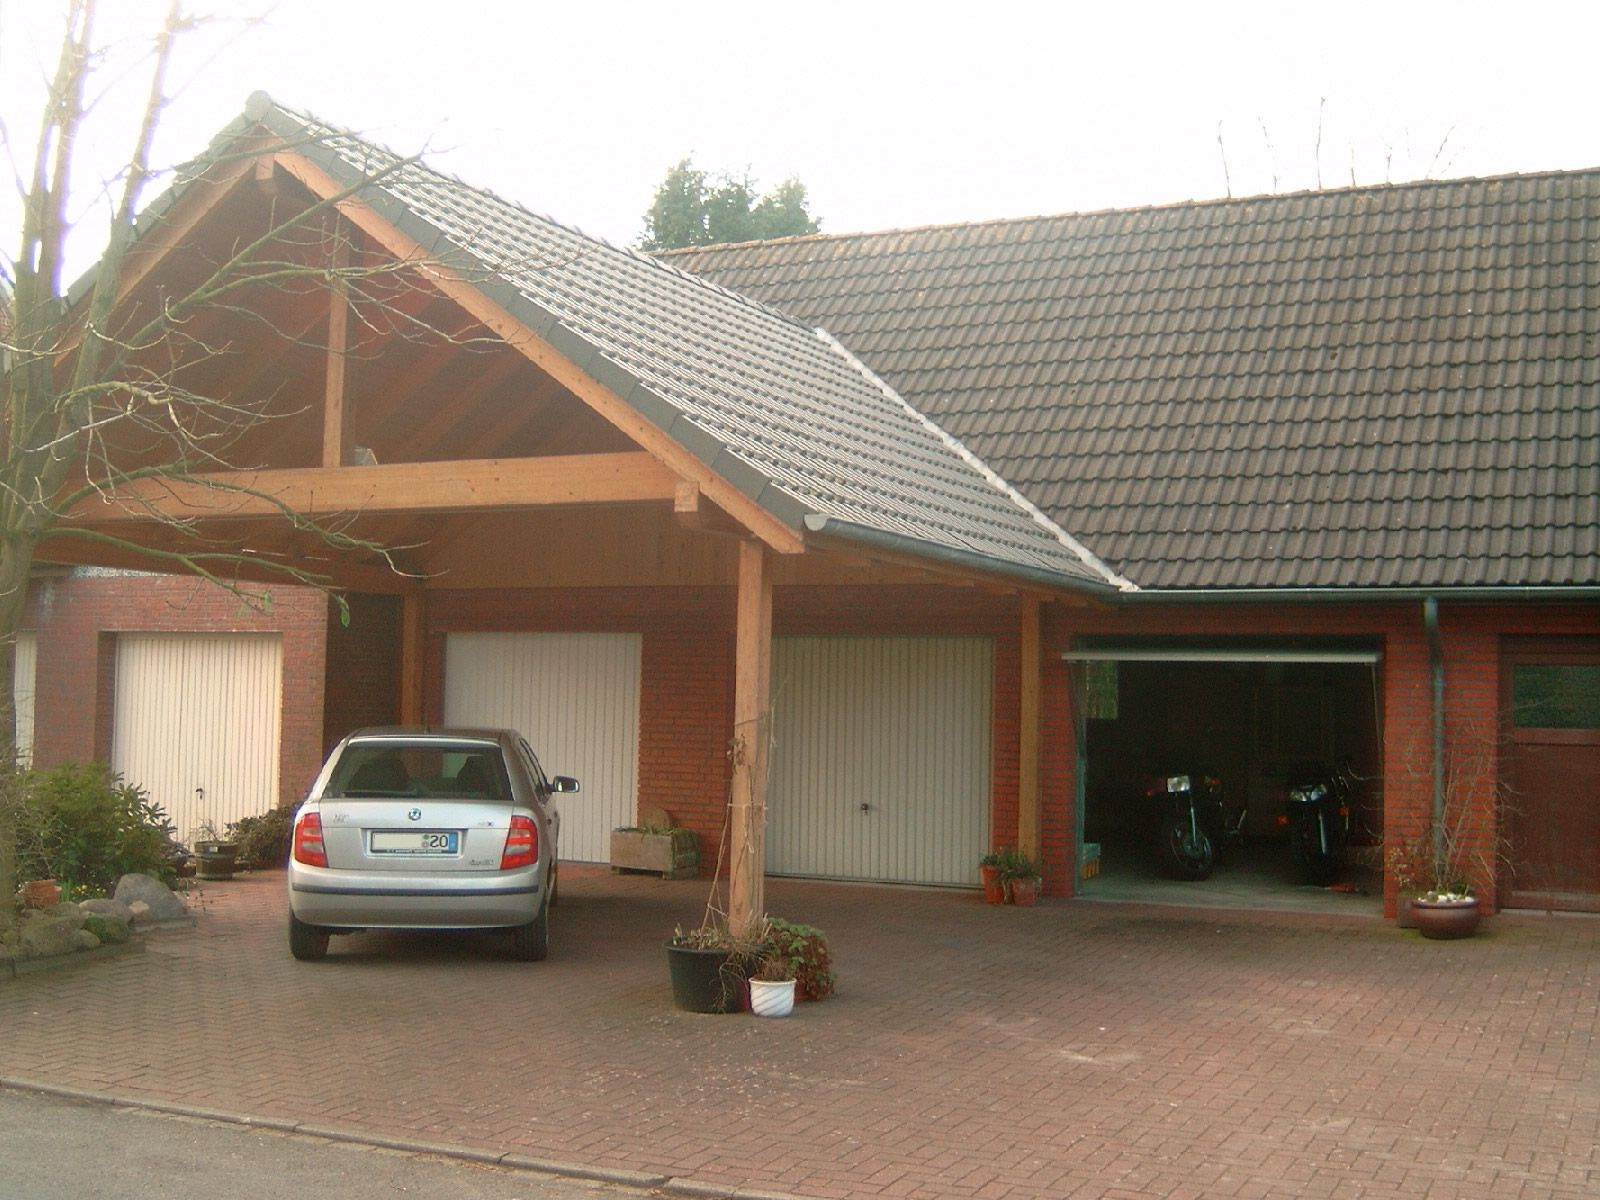 the official carport website carport net 3 car home design garage ideas pinterest. Black Bedroom Furniture Sets. Home Design Ideas